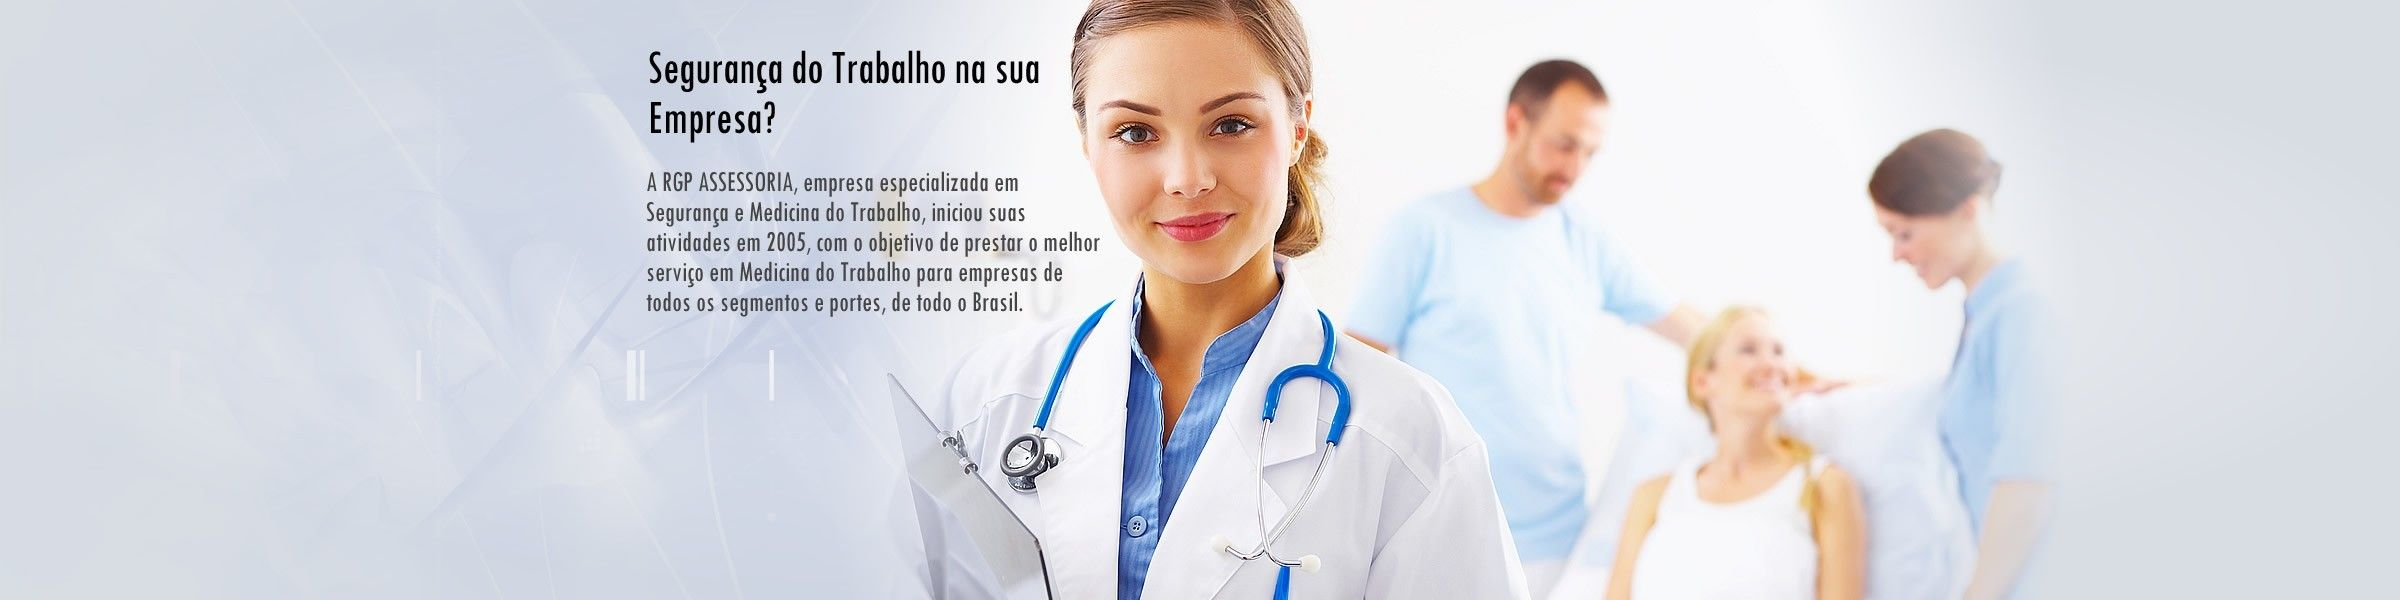 Atestado Ocupacional de Saúde Onde Achar no Cursino - Atestado Ocupacional de Saúde